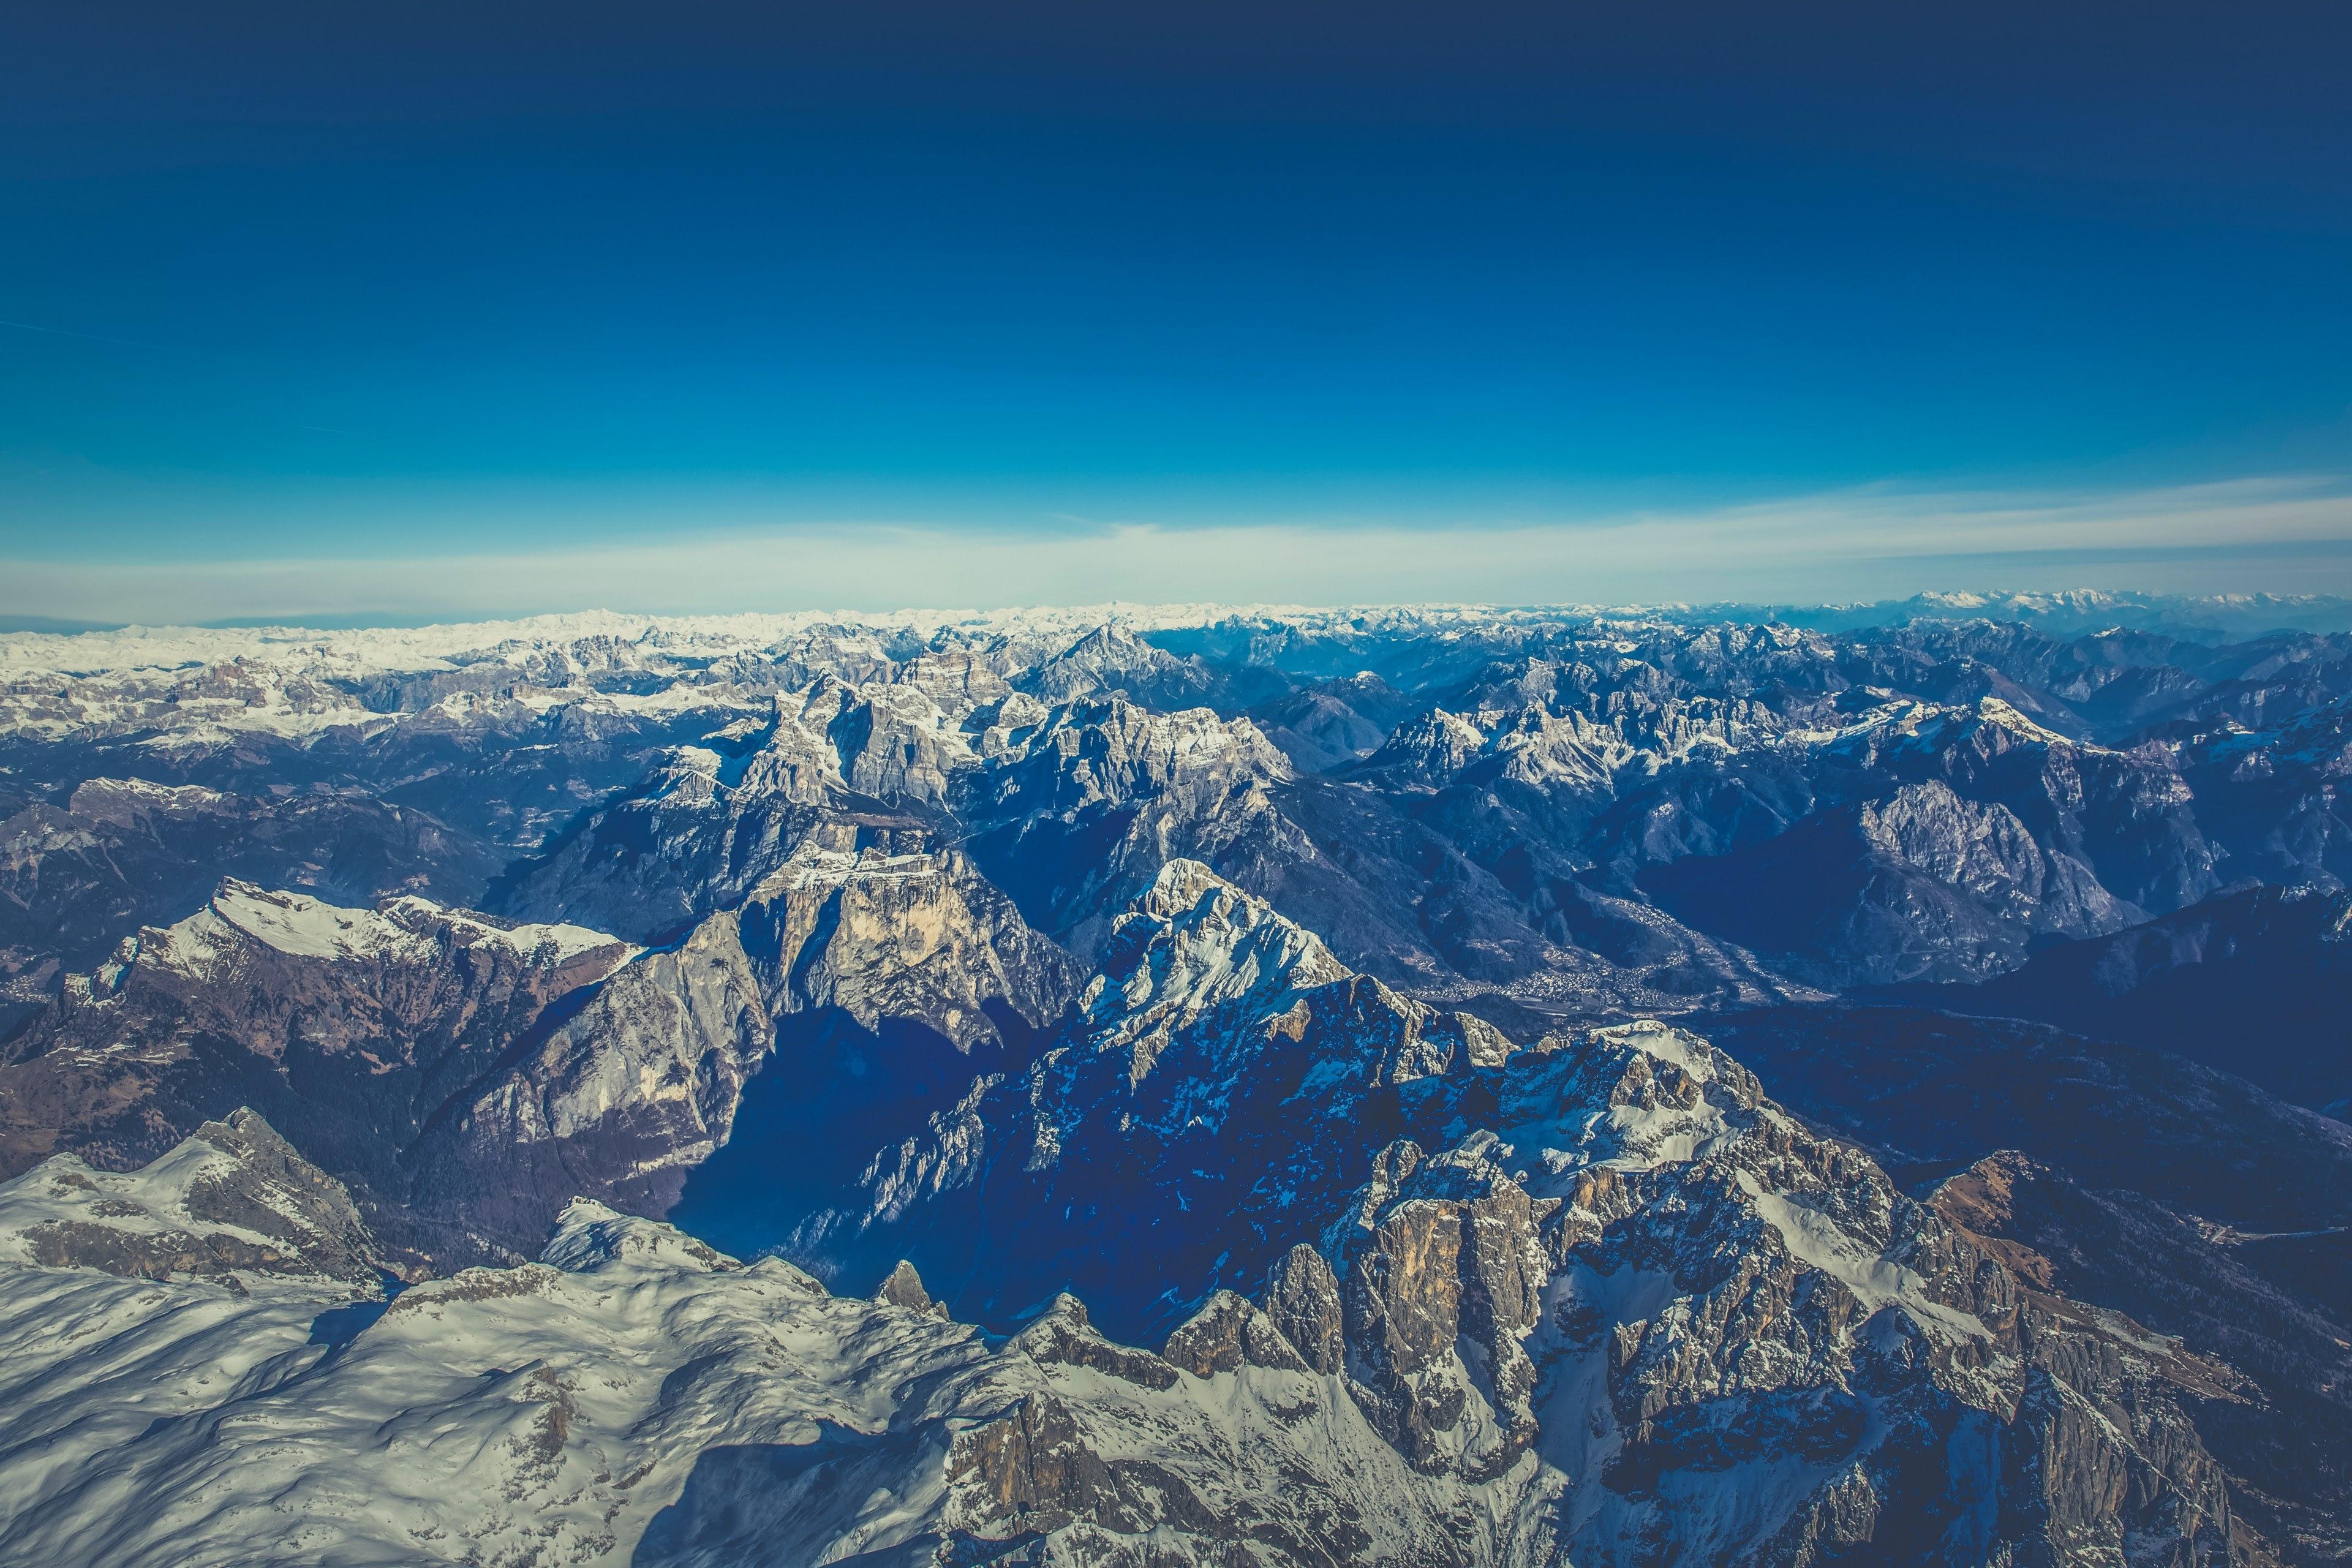 Alp Hot Air Balloon Panorama And Top View Hd 4k Wallpaper And Images, Photos, Reviews